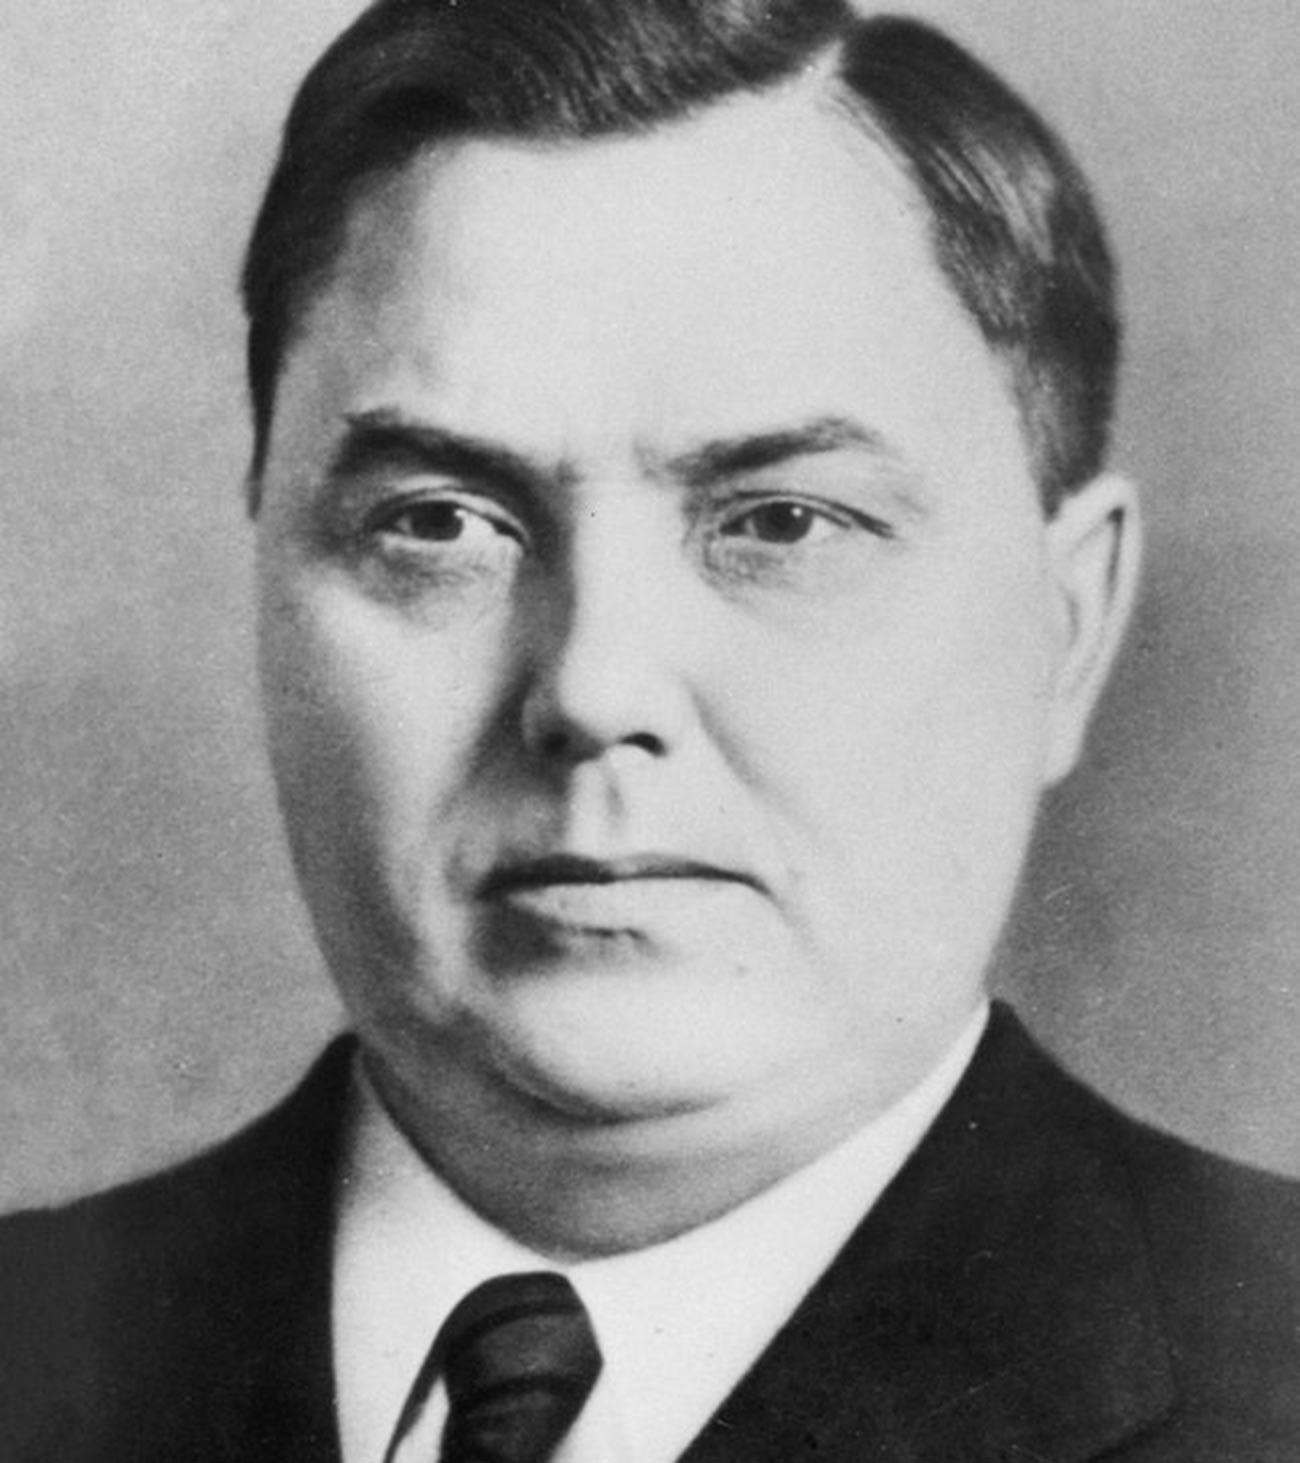 Georgy Malenkov